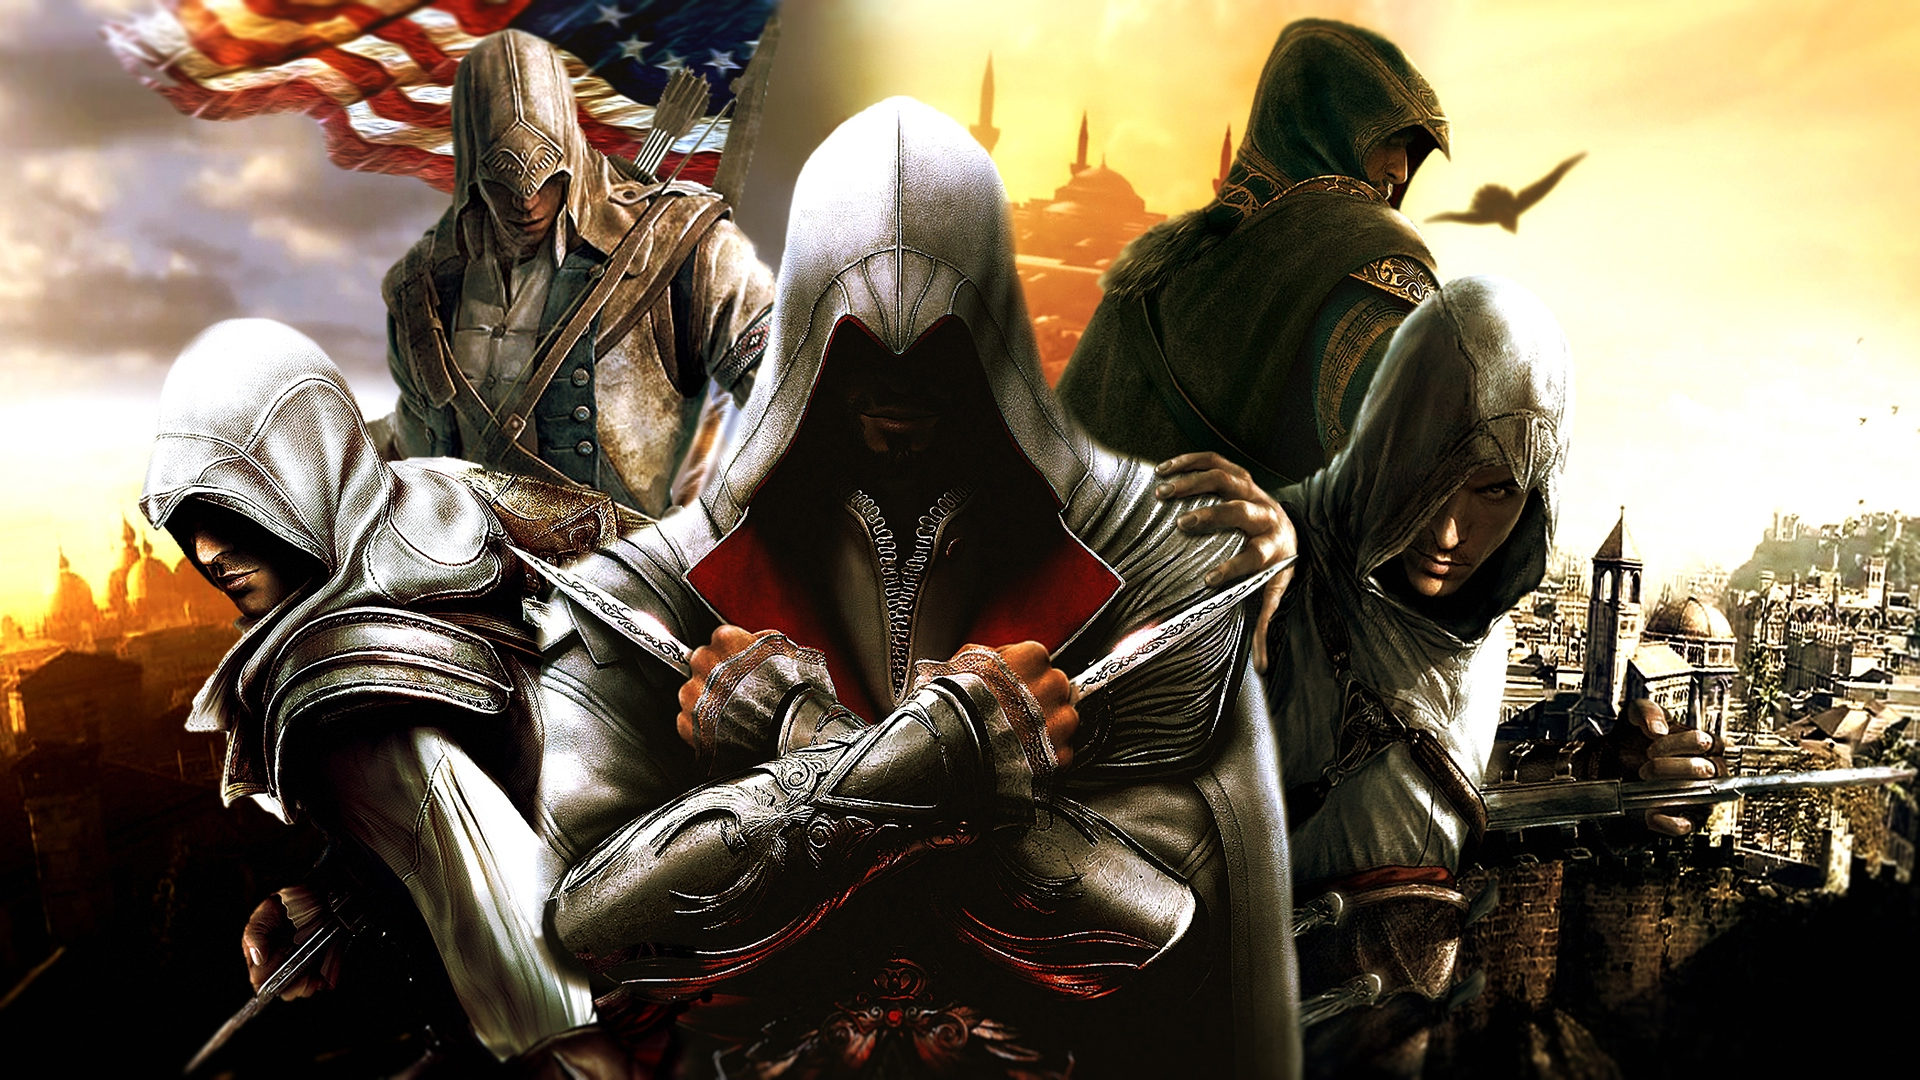 Assassins Creed   Assassins Creed Wallpaper 30820342 1920x1080